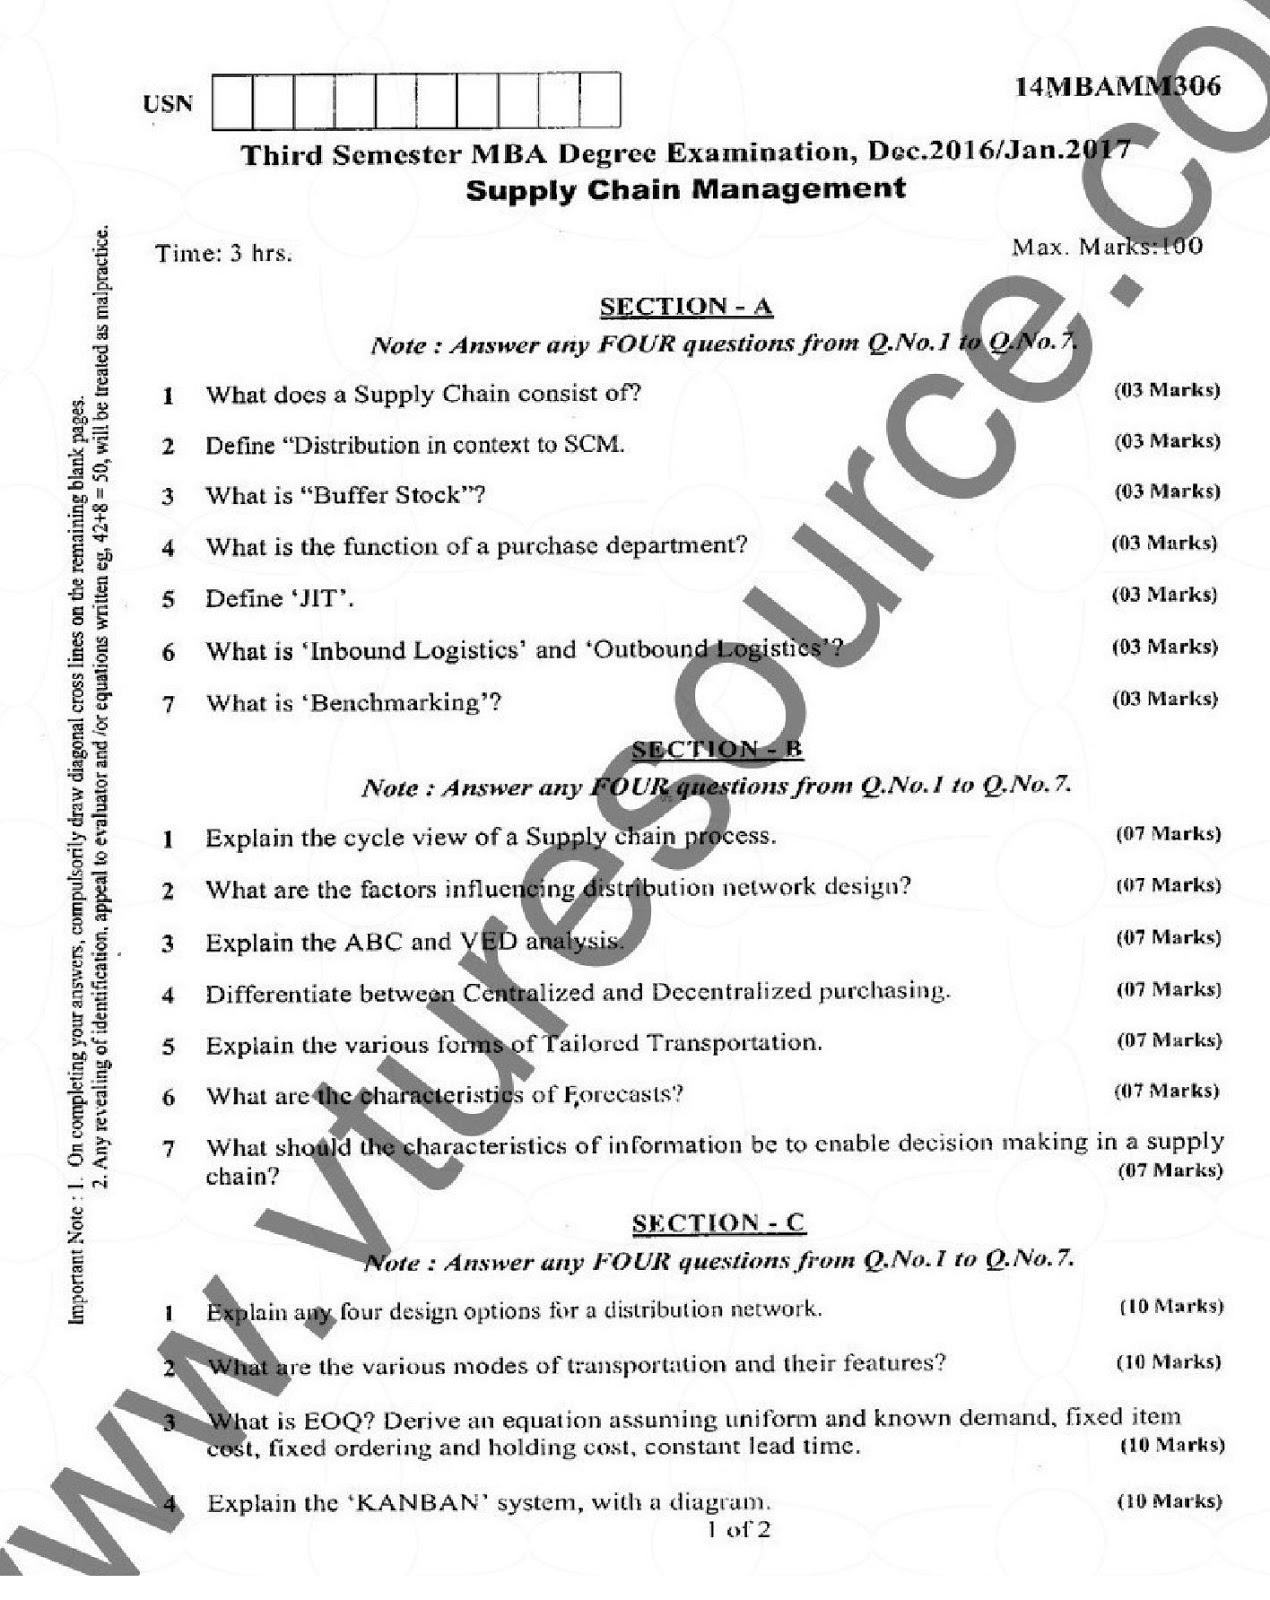 e-Paatashala: VTU MBA Third Semester Question Paper : Supply Chain